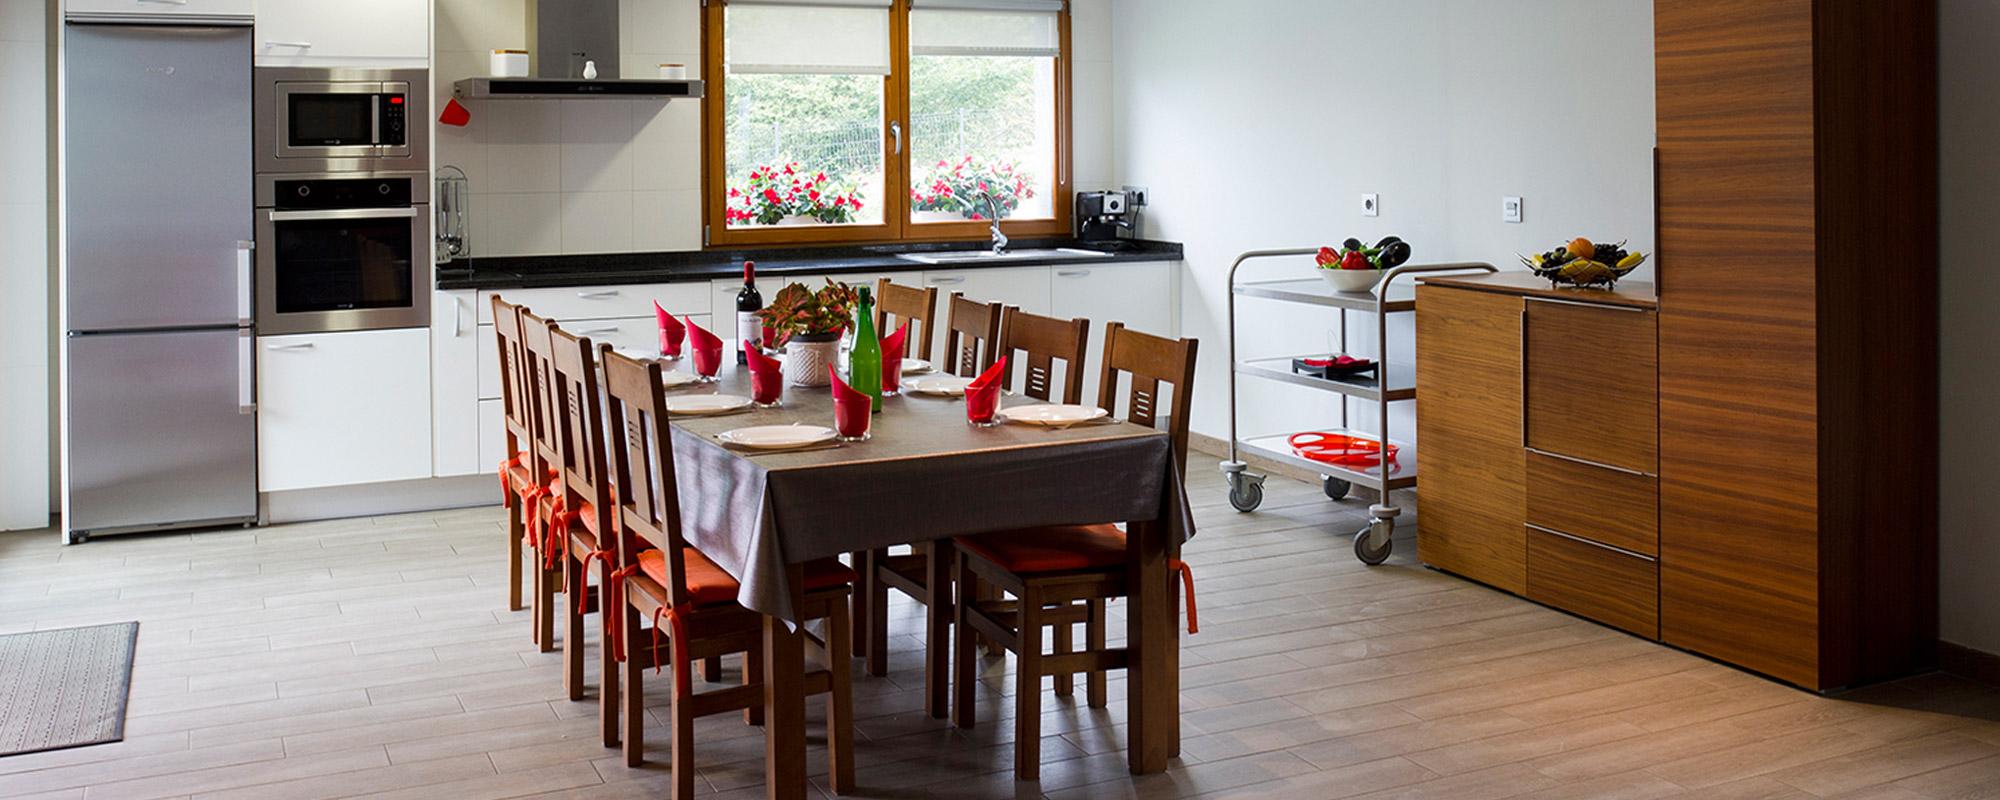 apartamento1-casa-rural-teileri-cocina